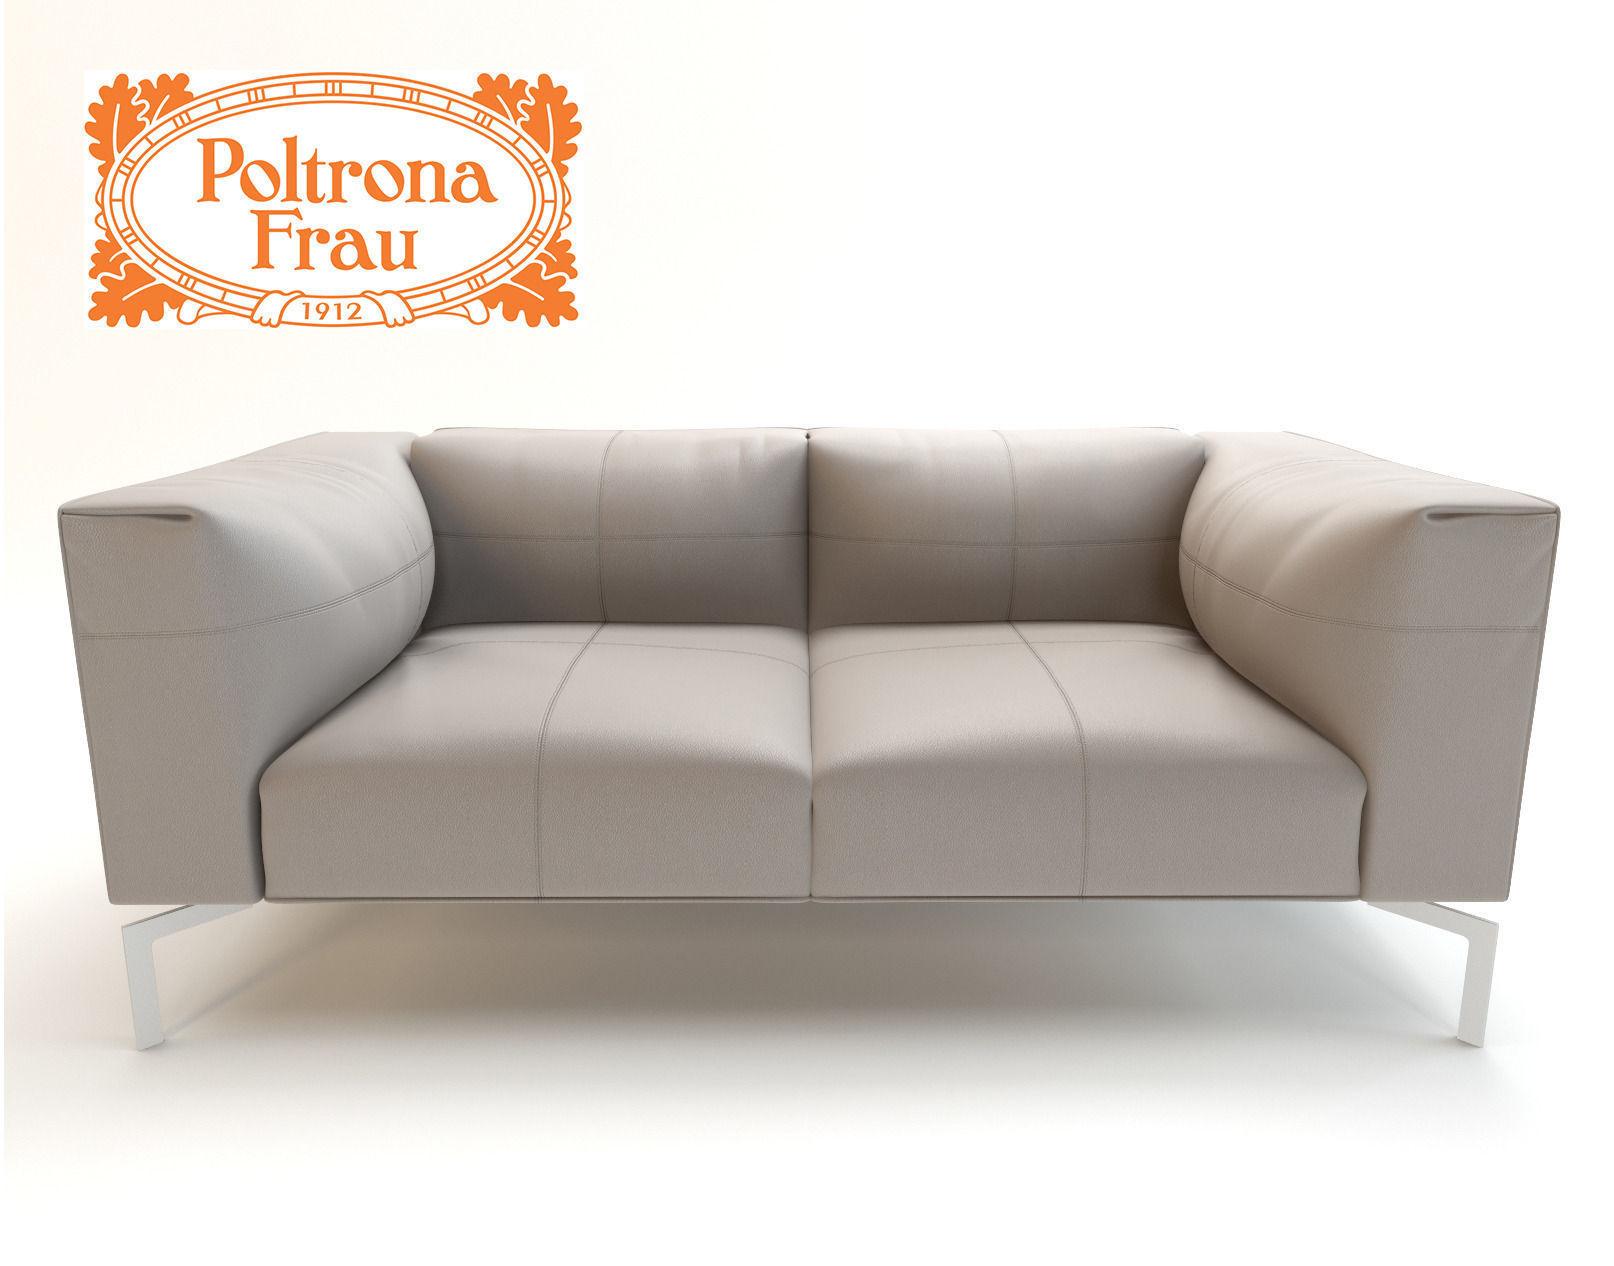 leather sofa poltrona frau 3d model max fbx. Black Bedroom Furniture Sets. Home Design Ideas